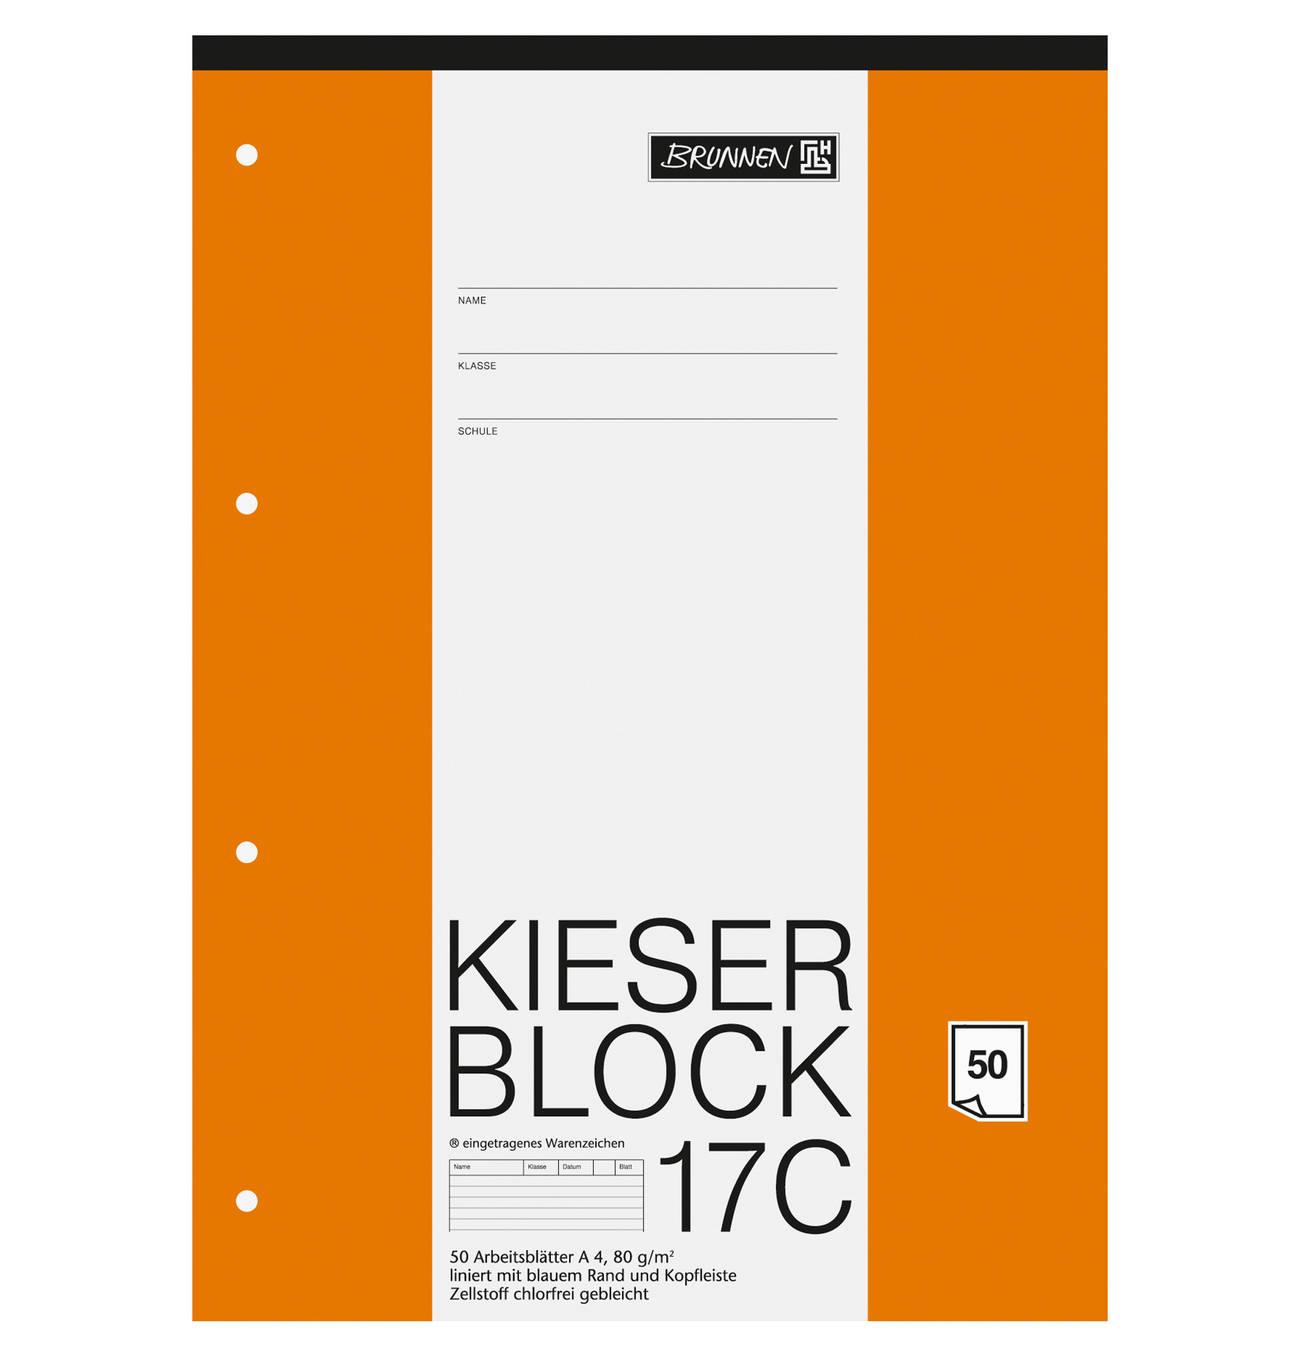 Kieser Block A4 Kieser 07 0017c Liniert Lineatur 21